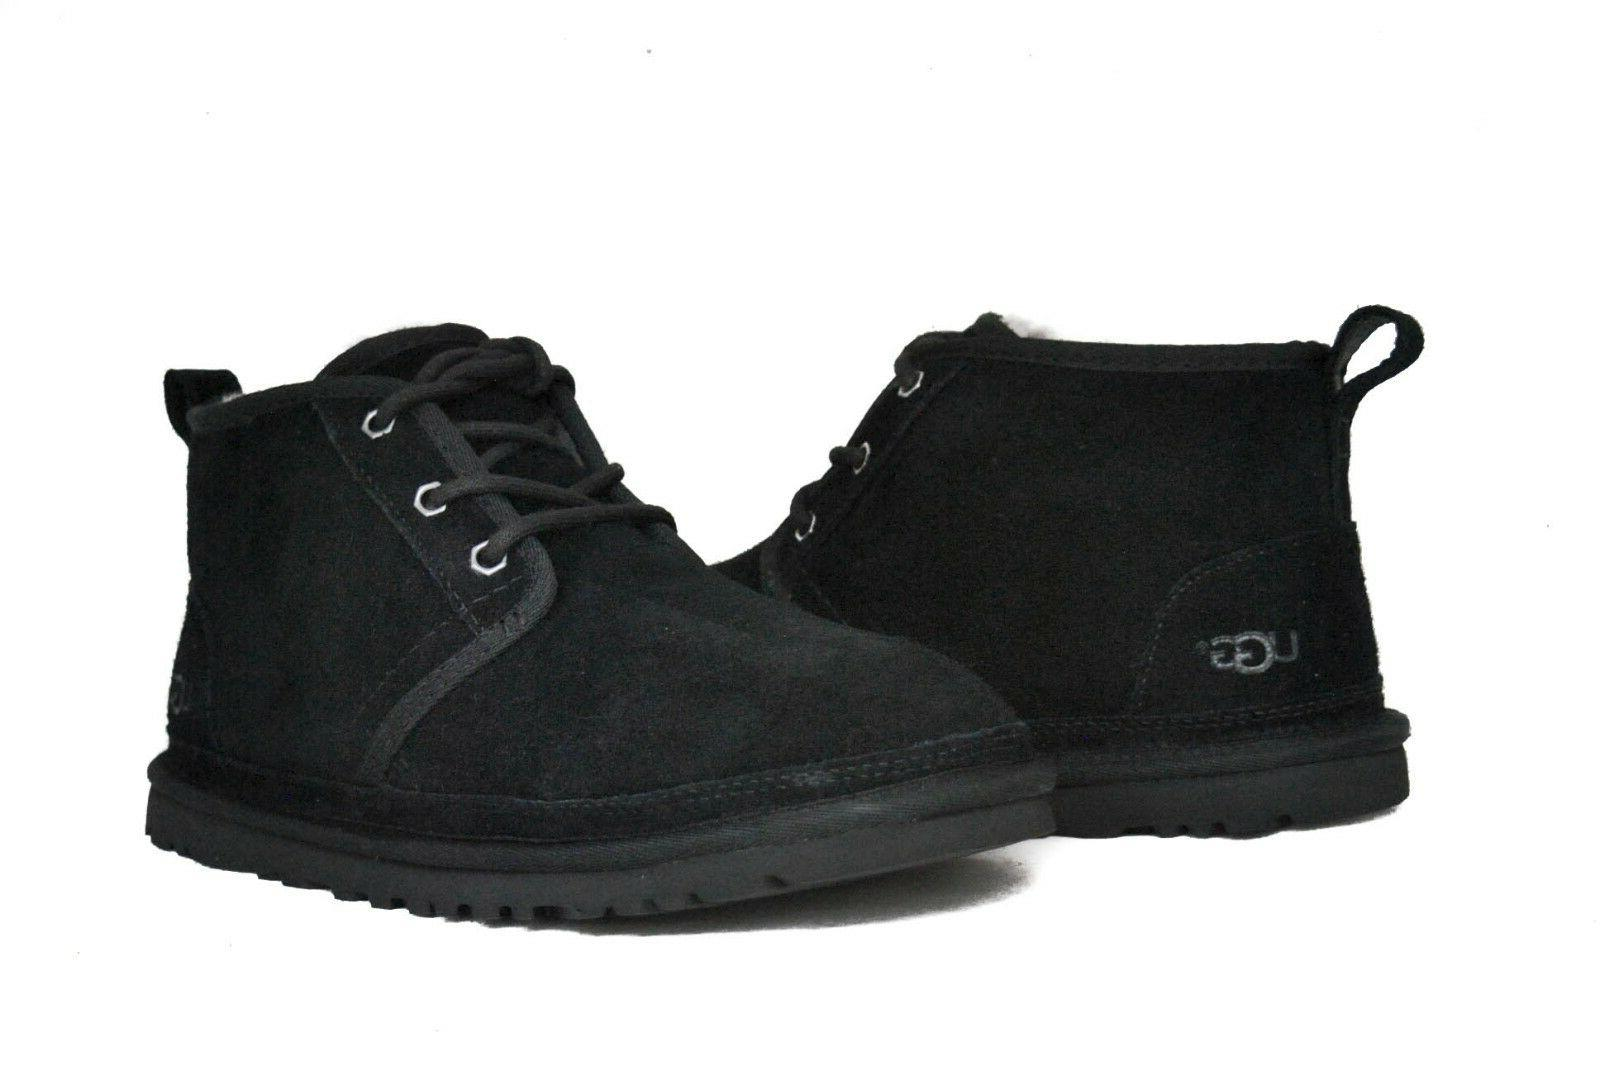 UGG Australia Men's Neumel 3236 Shoes Black Suede NEW Sz 6-1